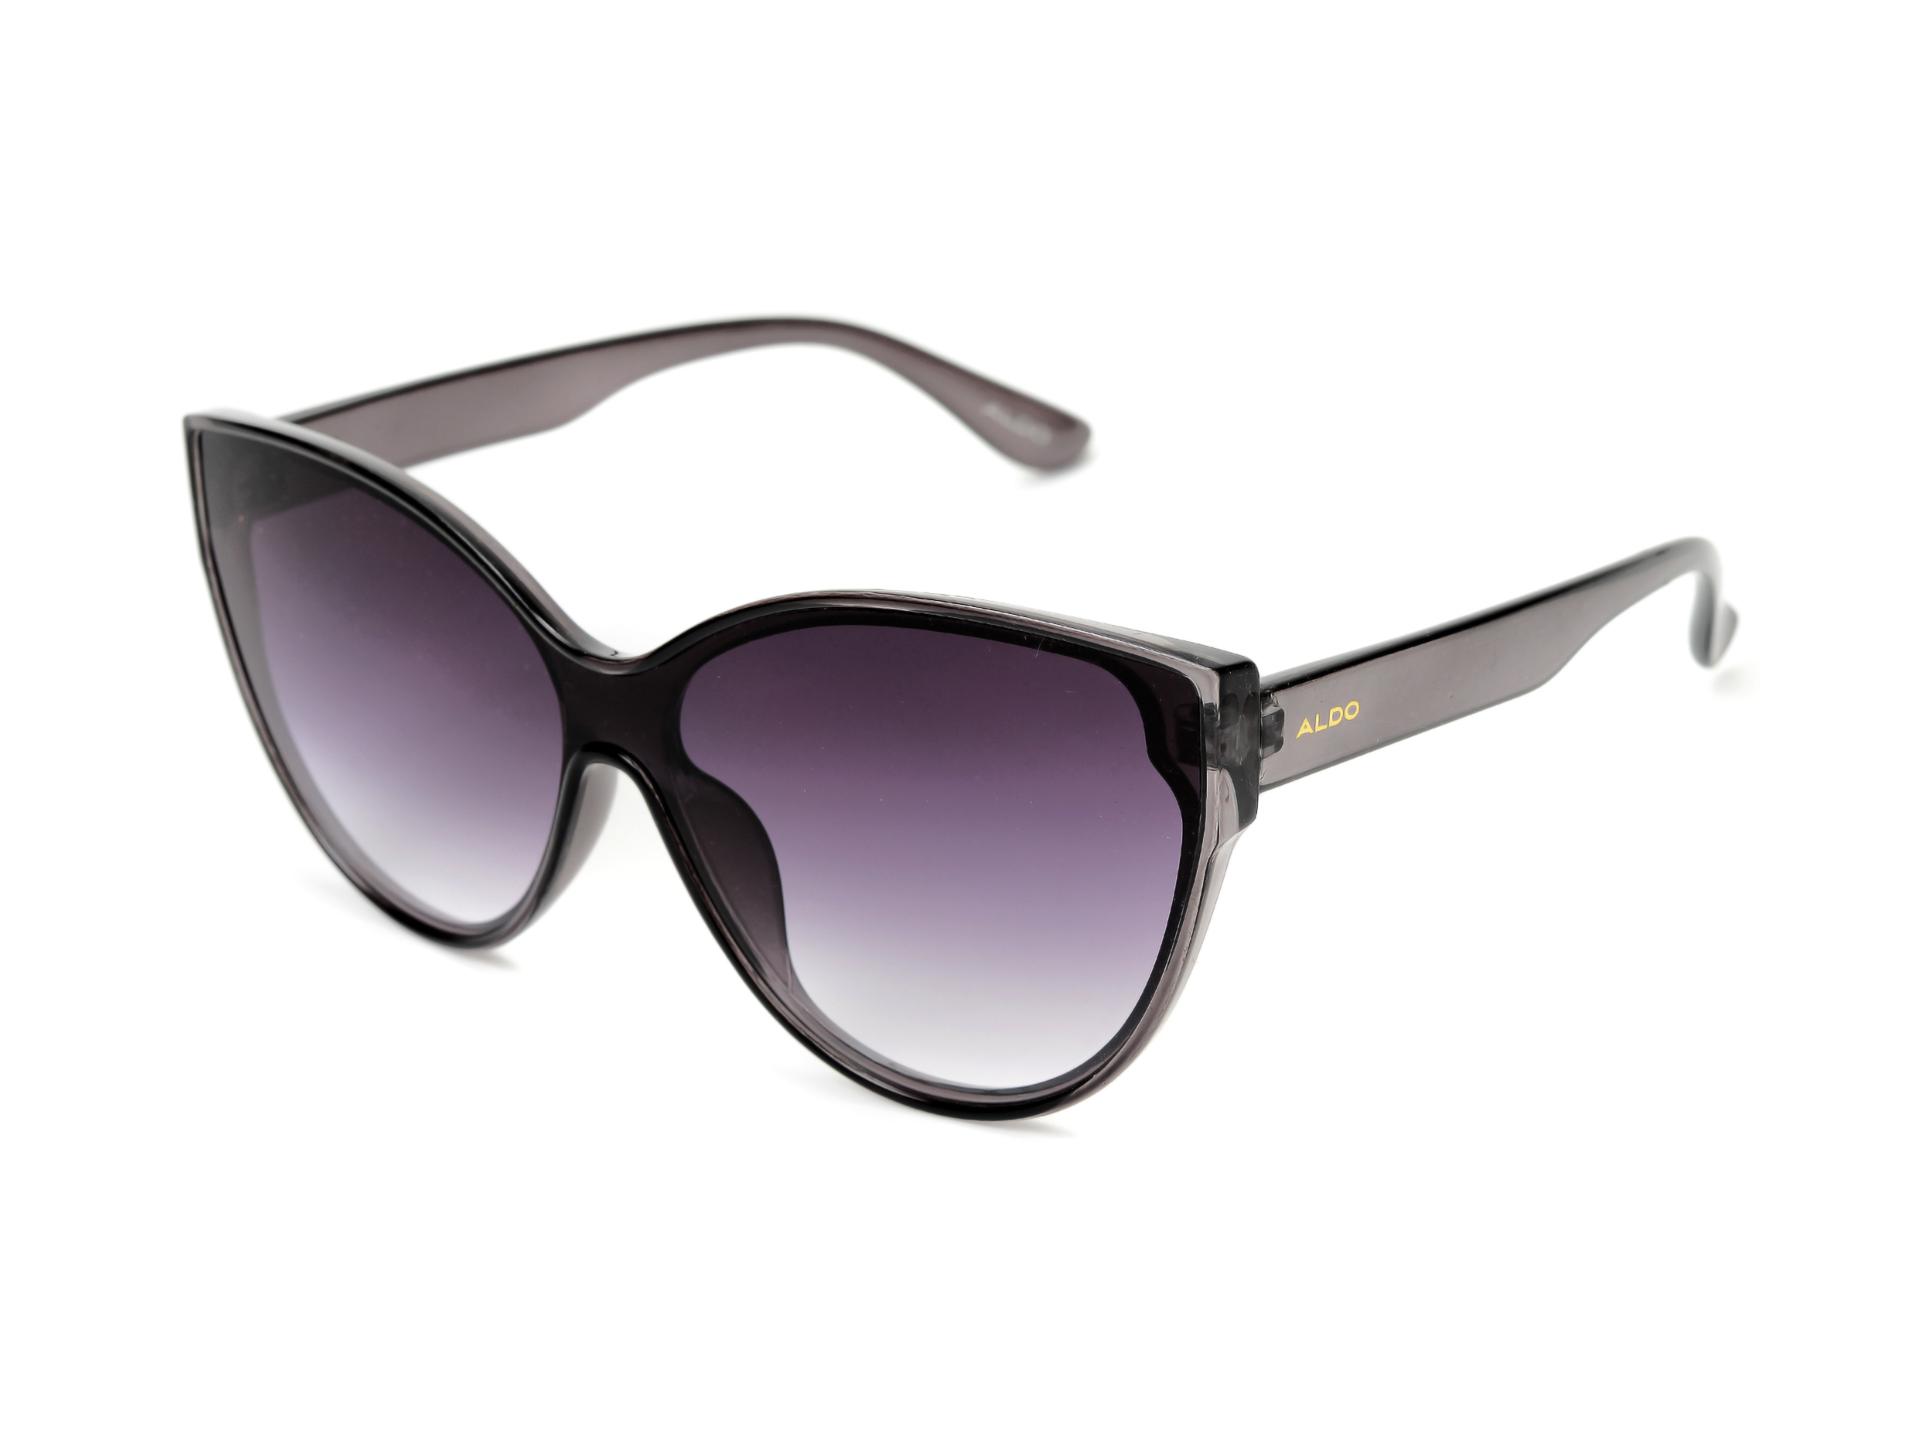 Ochelari de soare ALDO negri, Pedra001, din PVC imagine